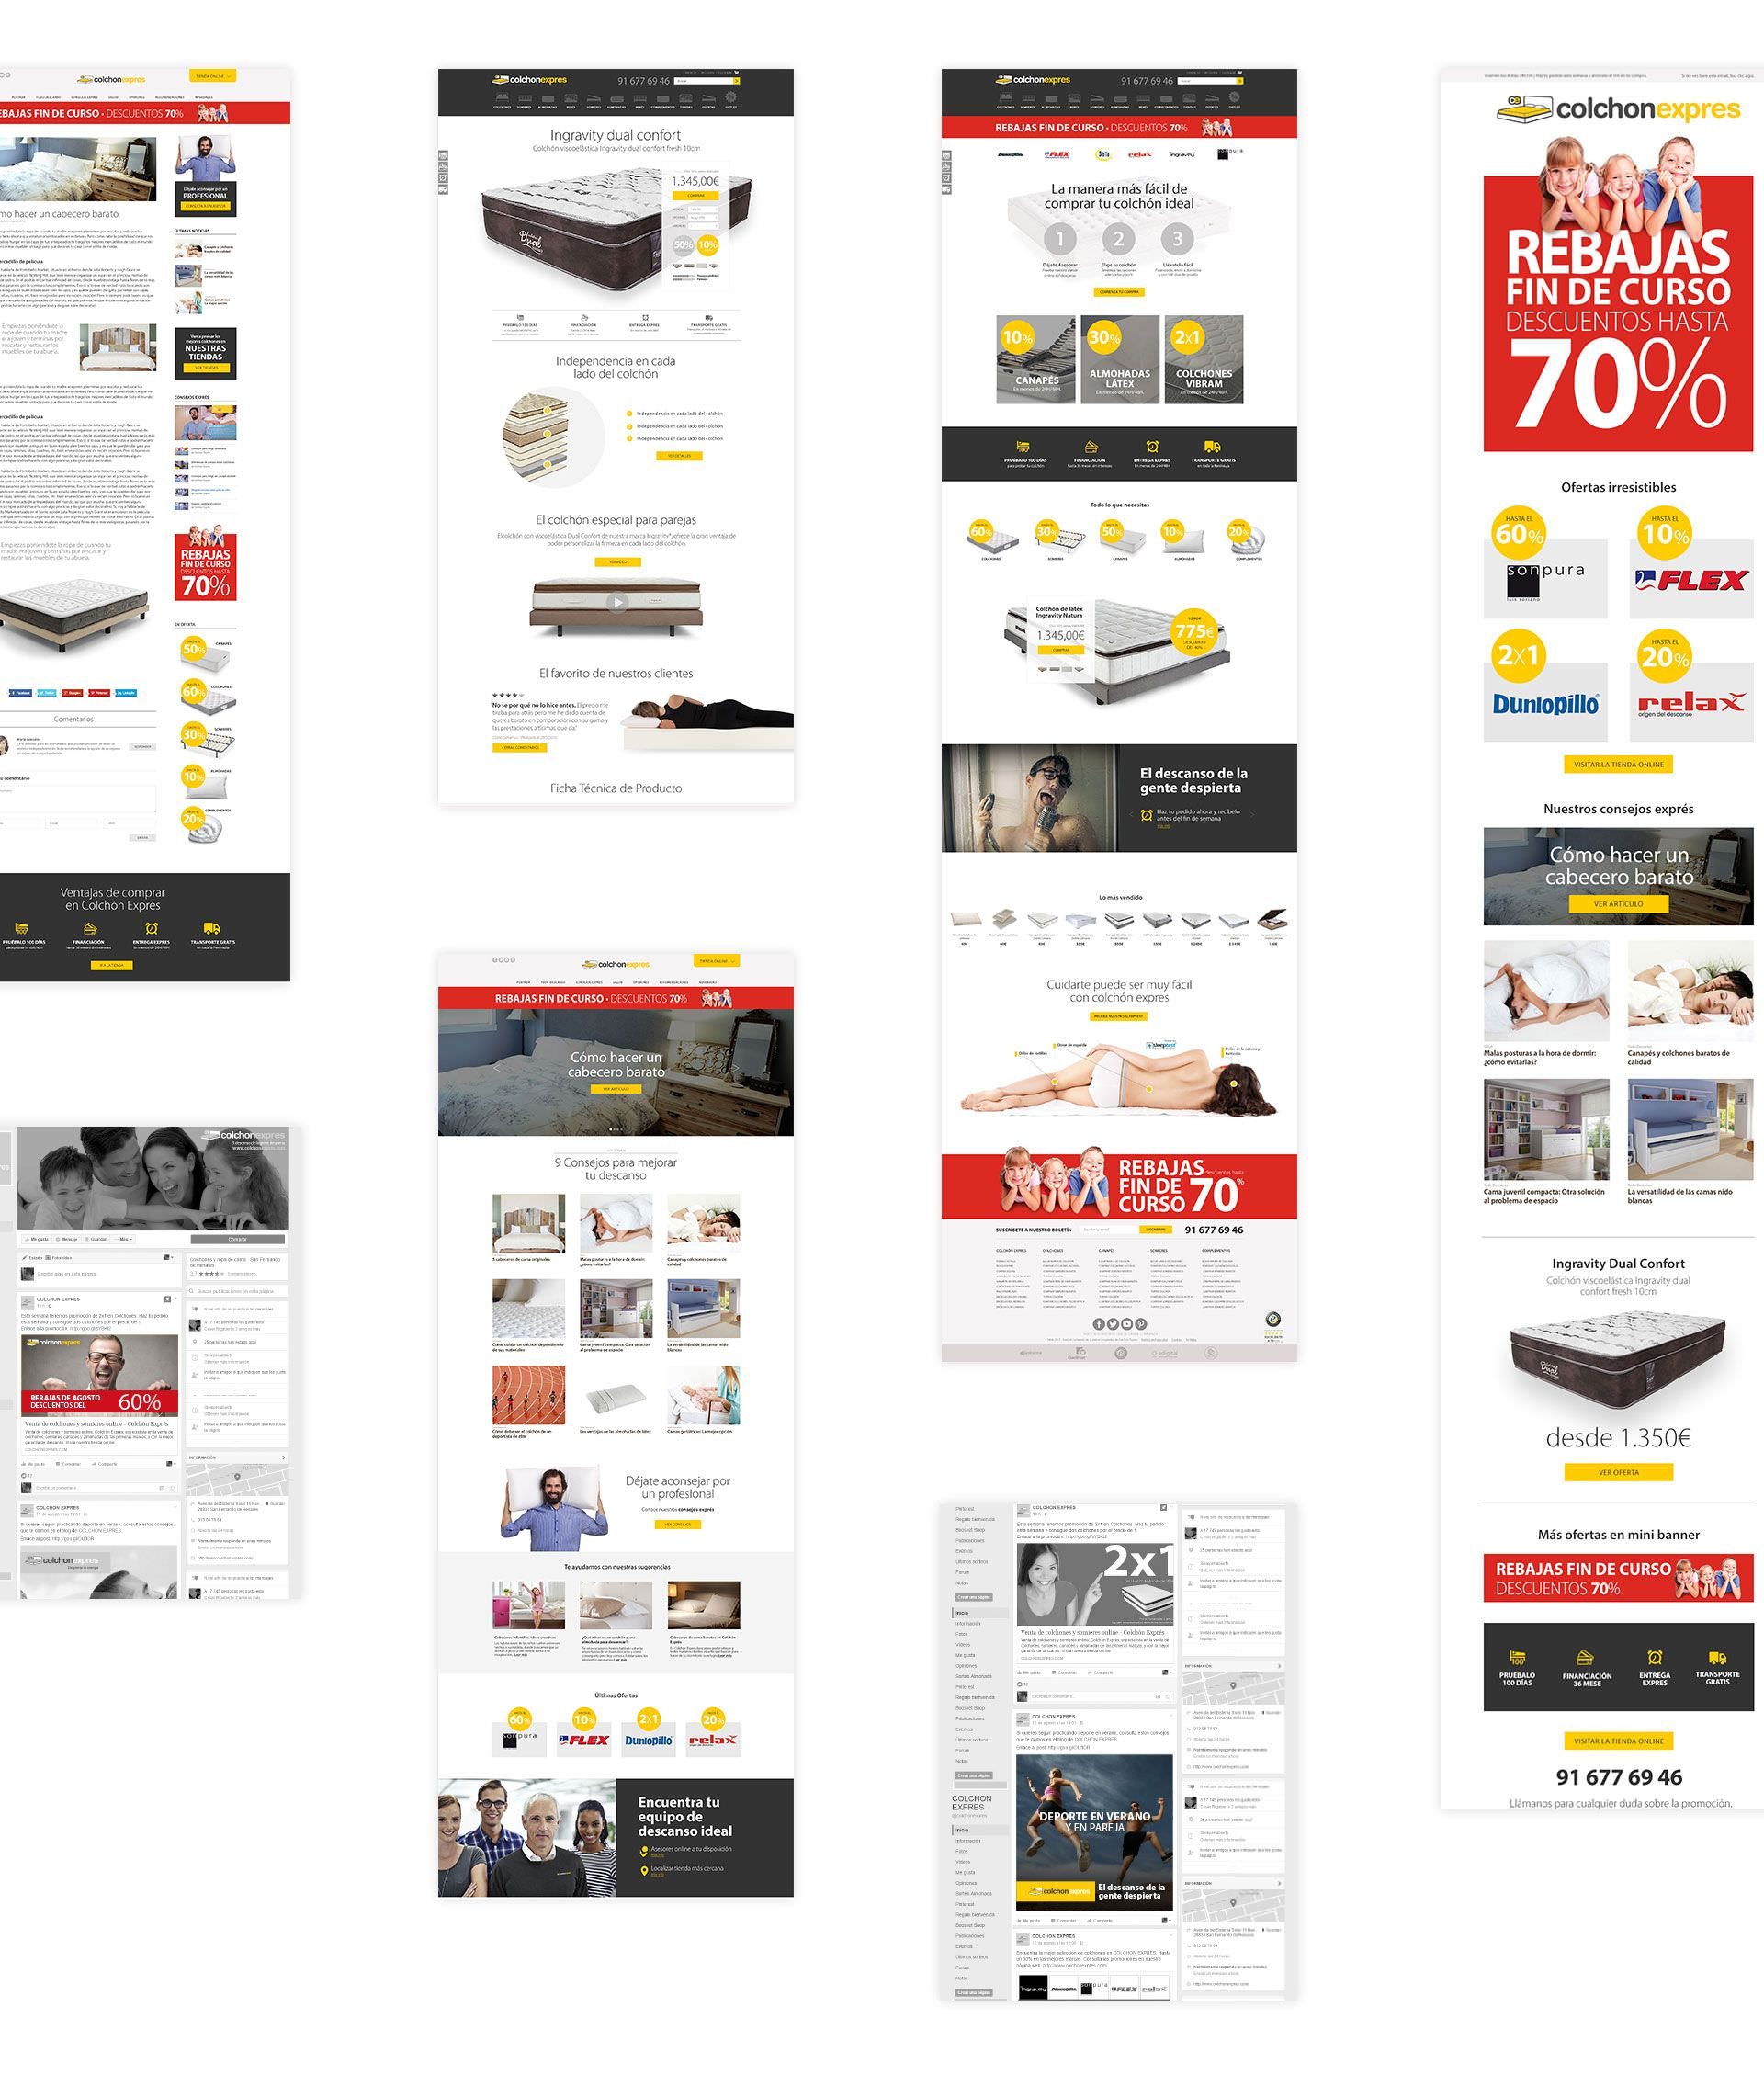 Diseño web para Colchón Exprés